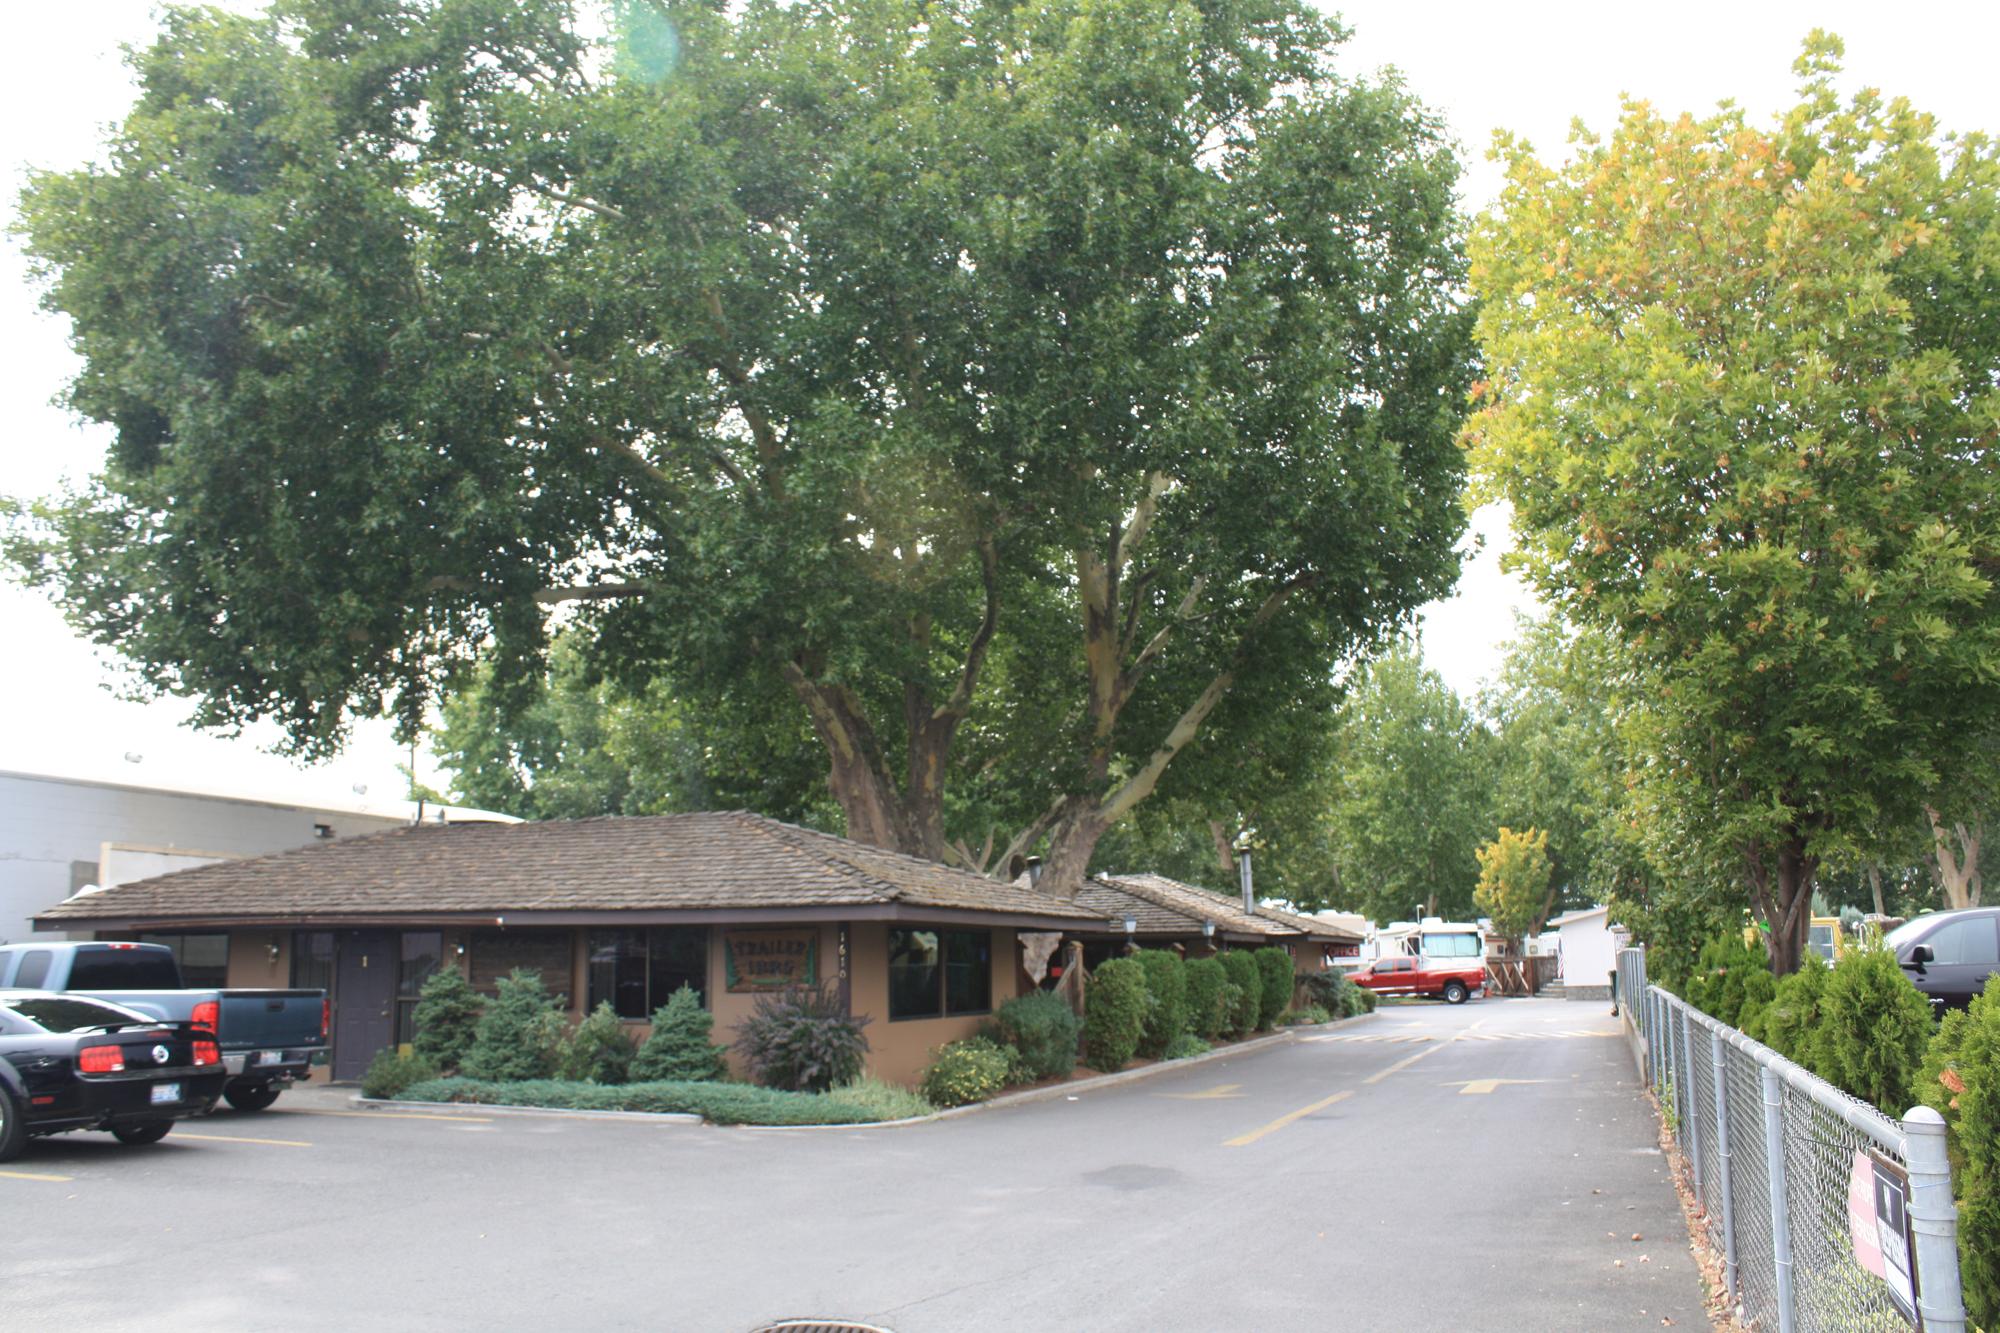 Trailer Inns RV Park of Yakima